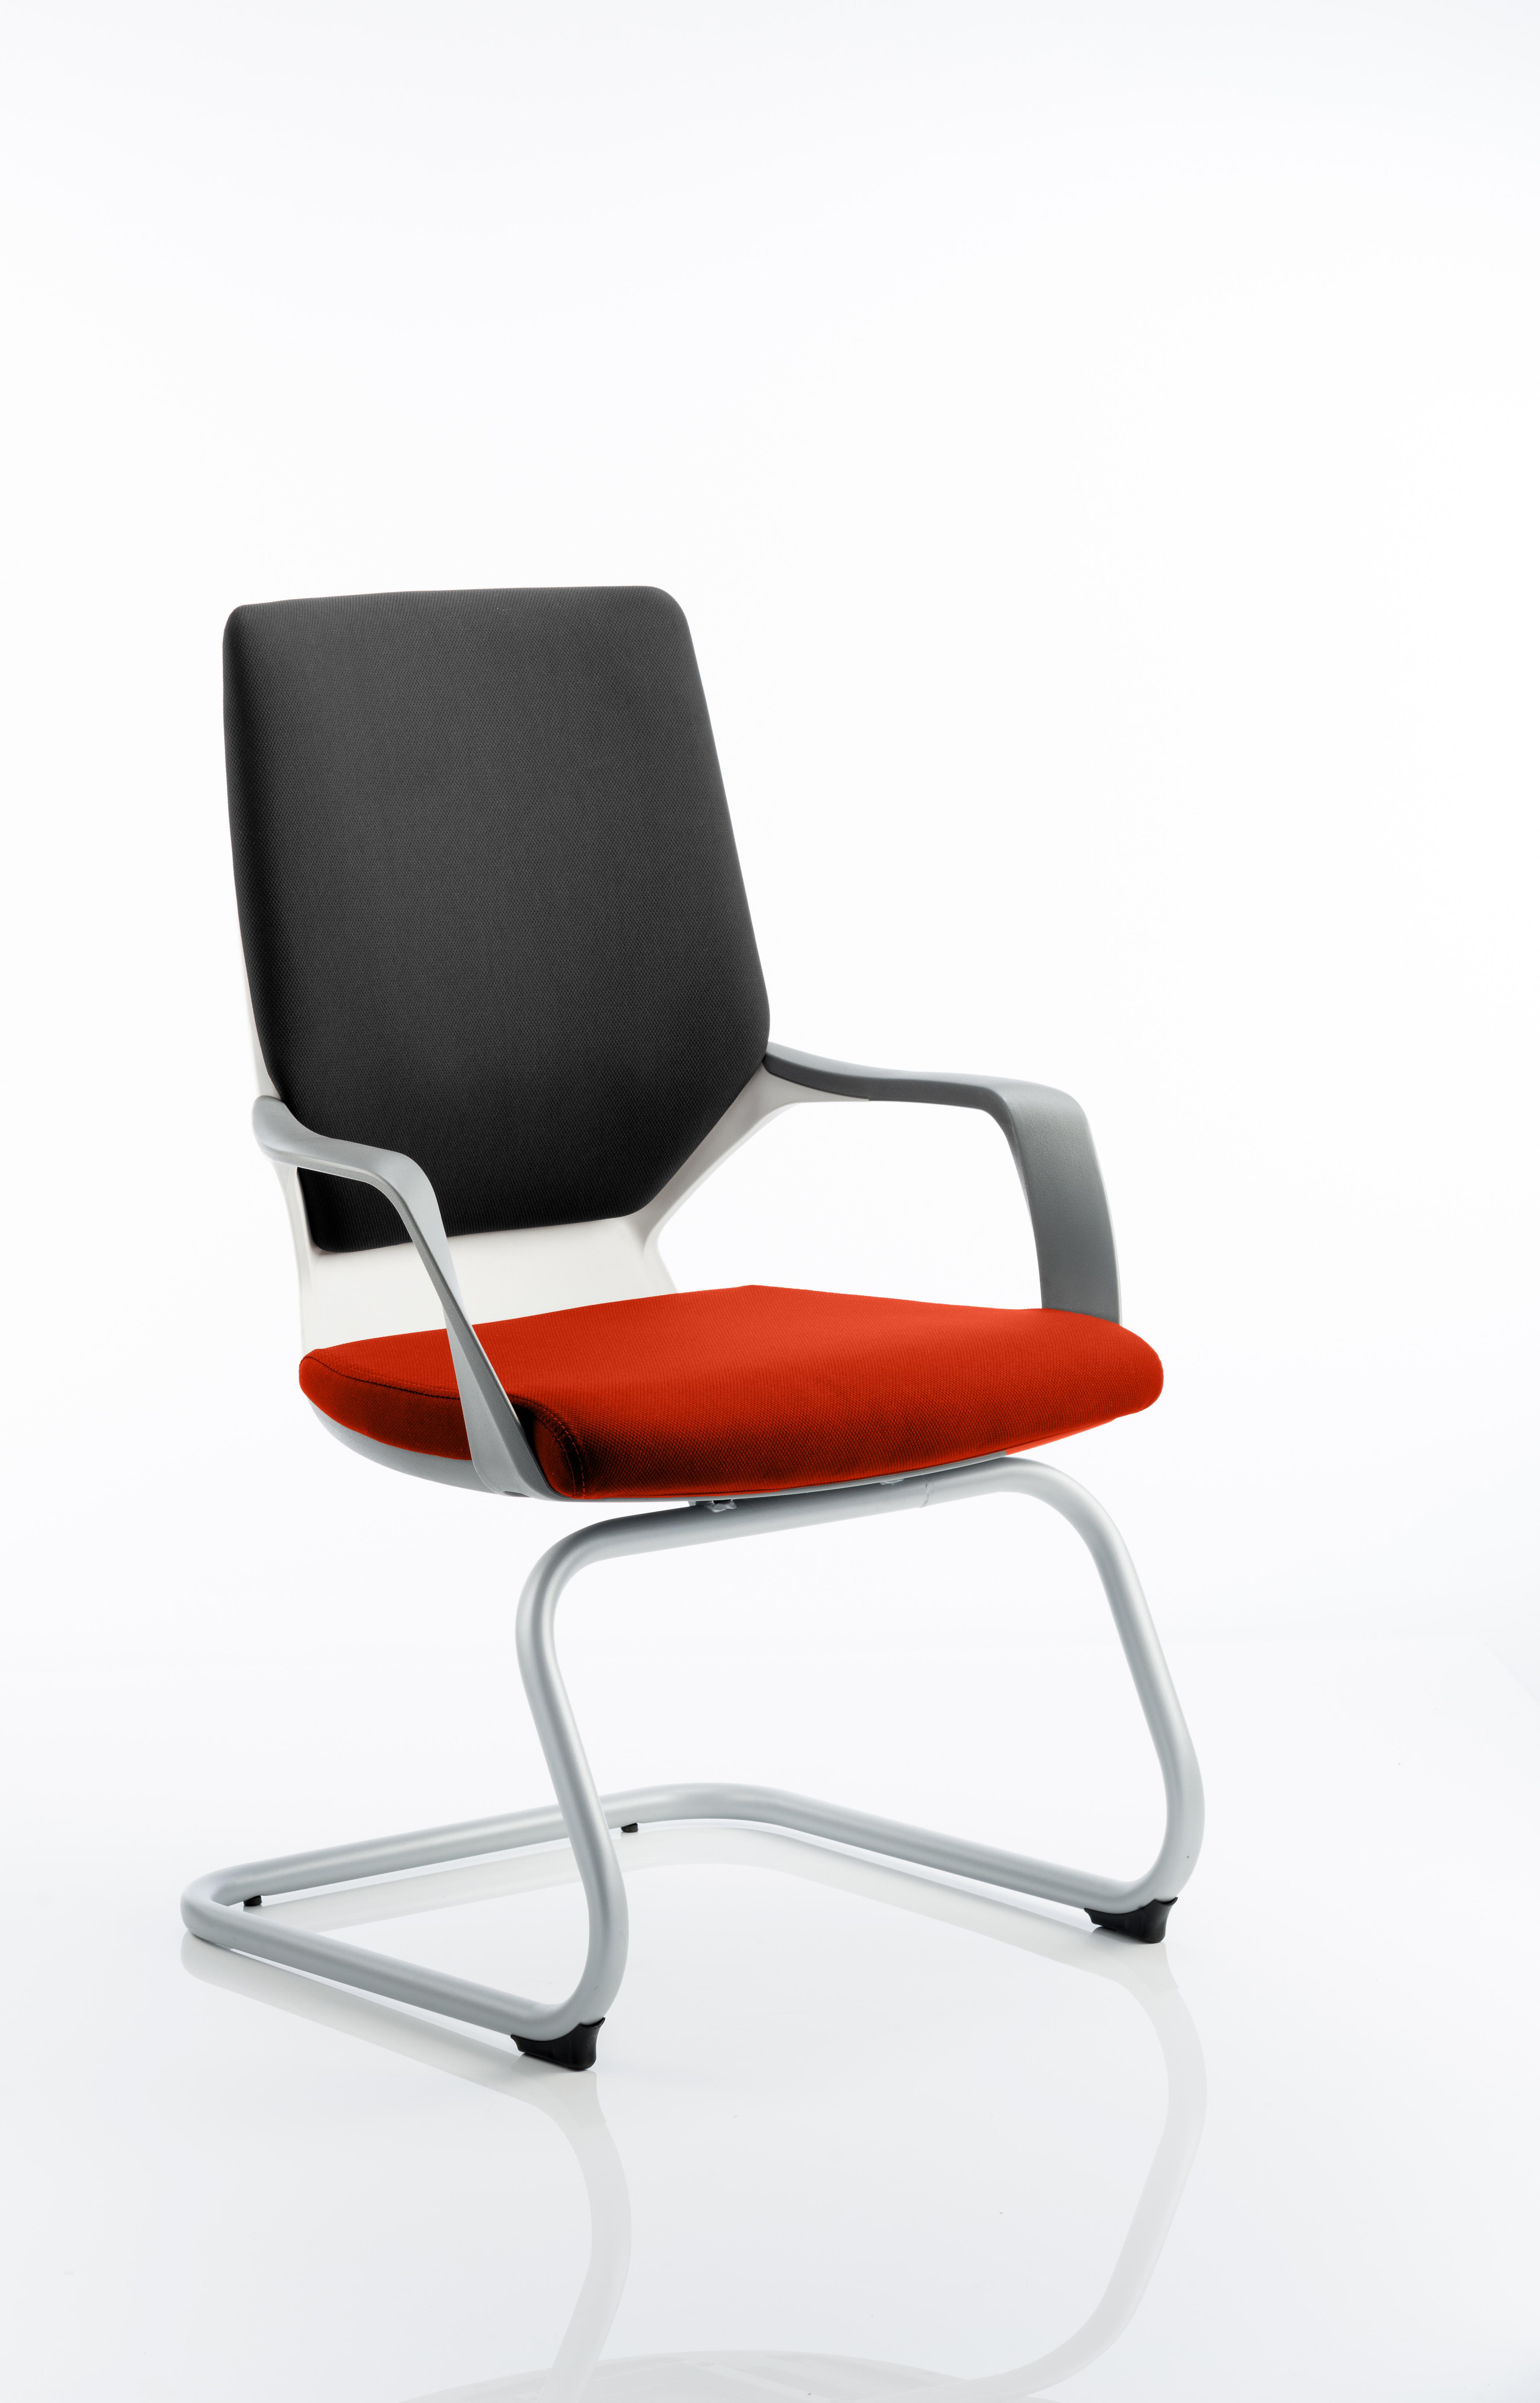 Xenon Visitor White Shell Bespoke Colour Seat Tabasco Red